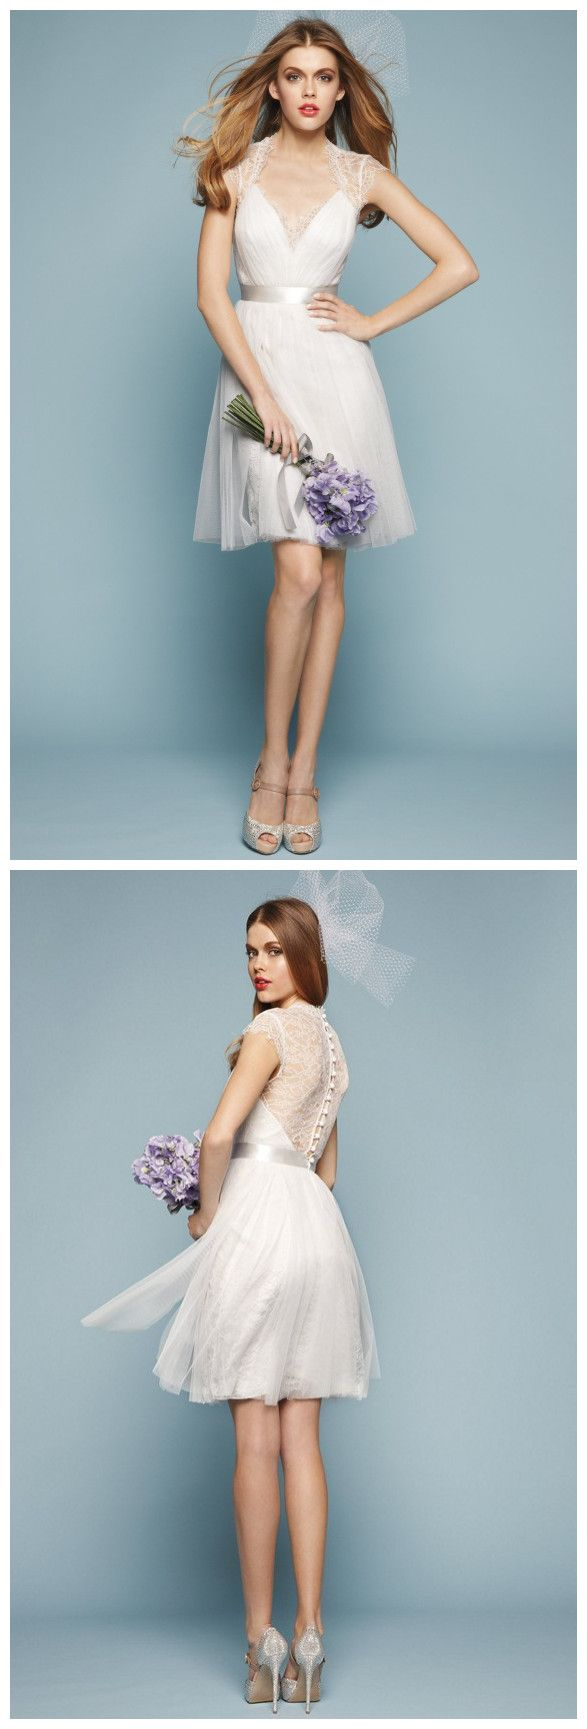 59 best casamento images on Pinterest   Dream wedding, Wedding ideas ...